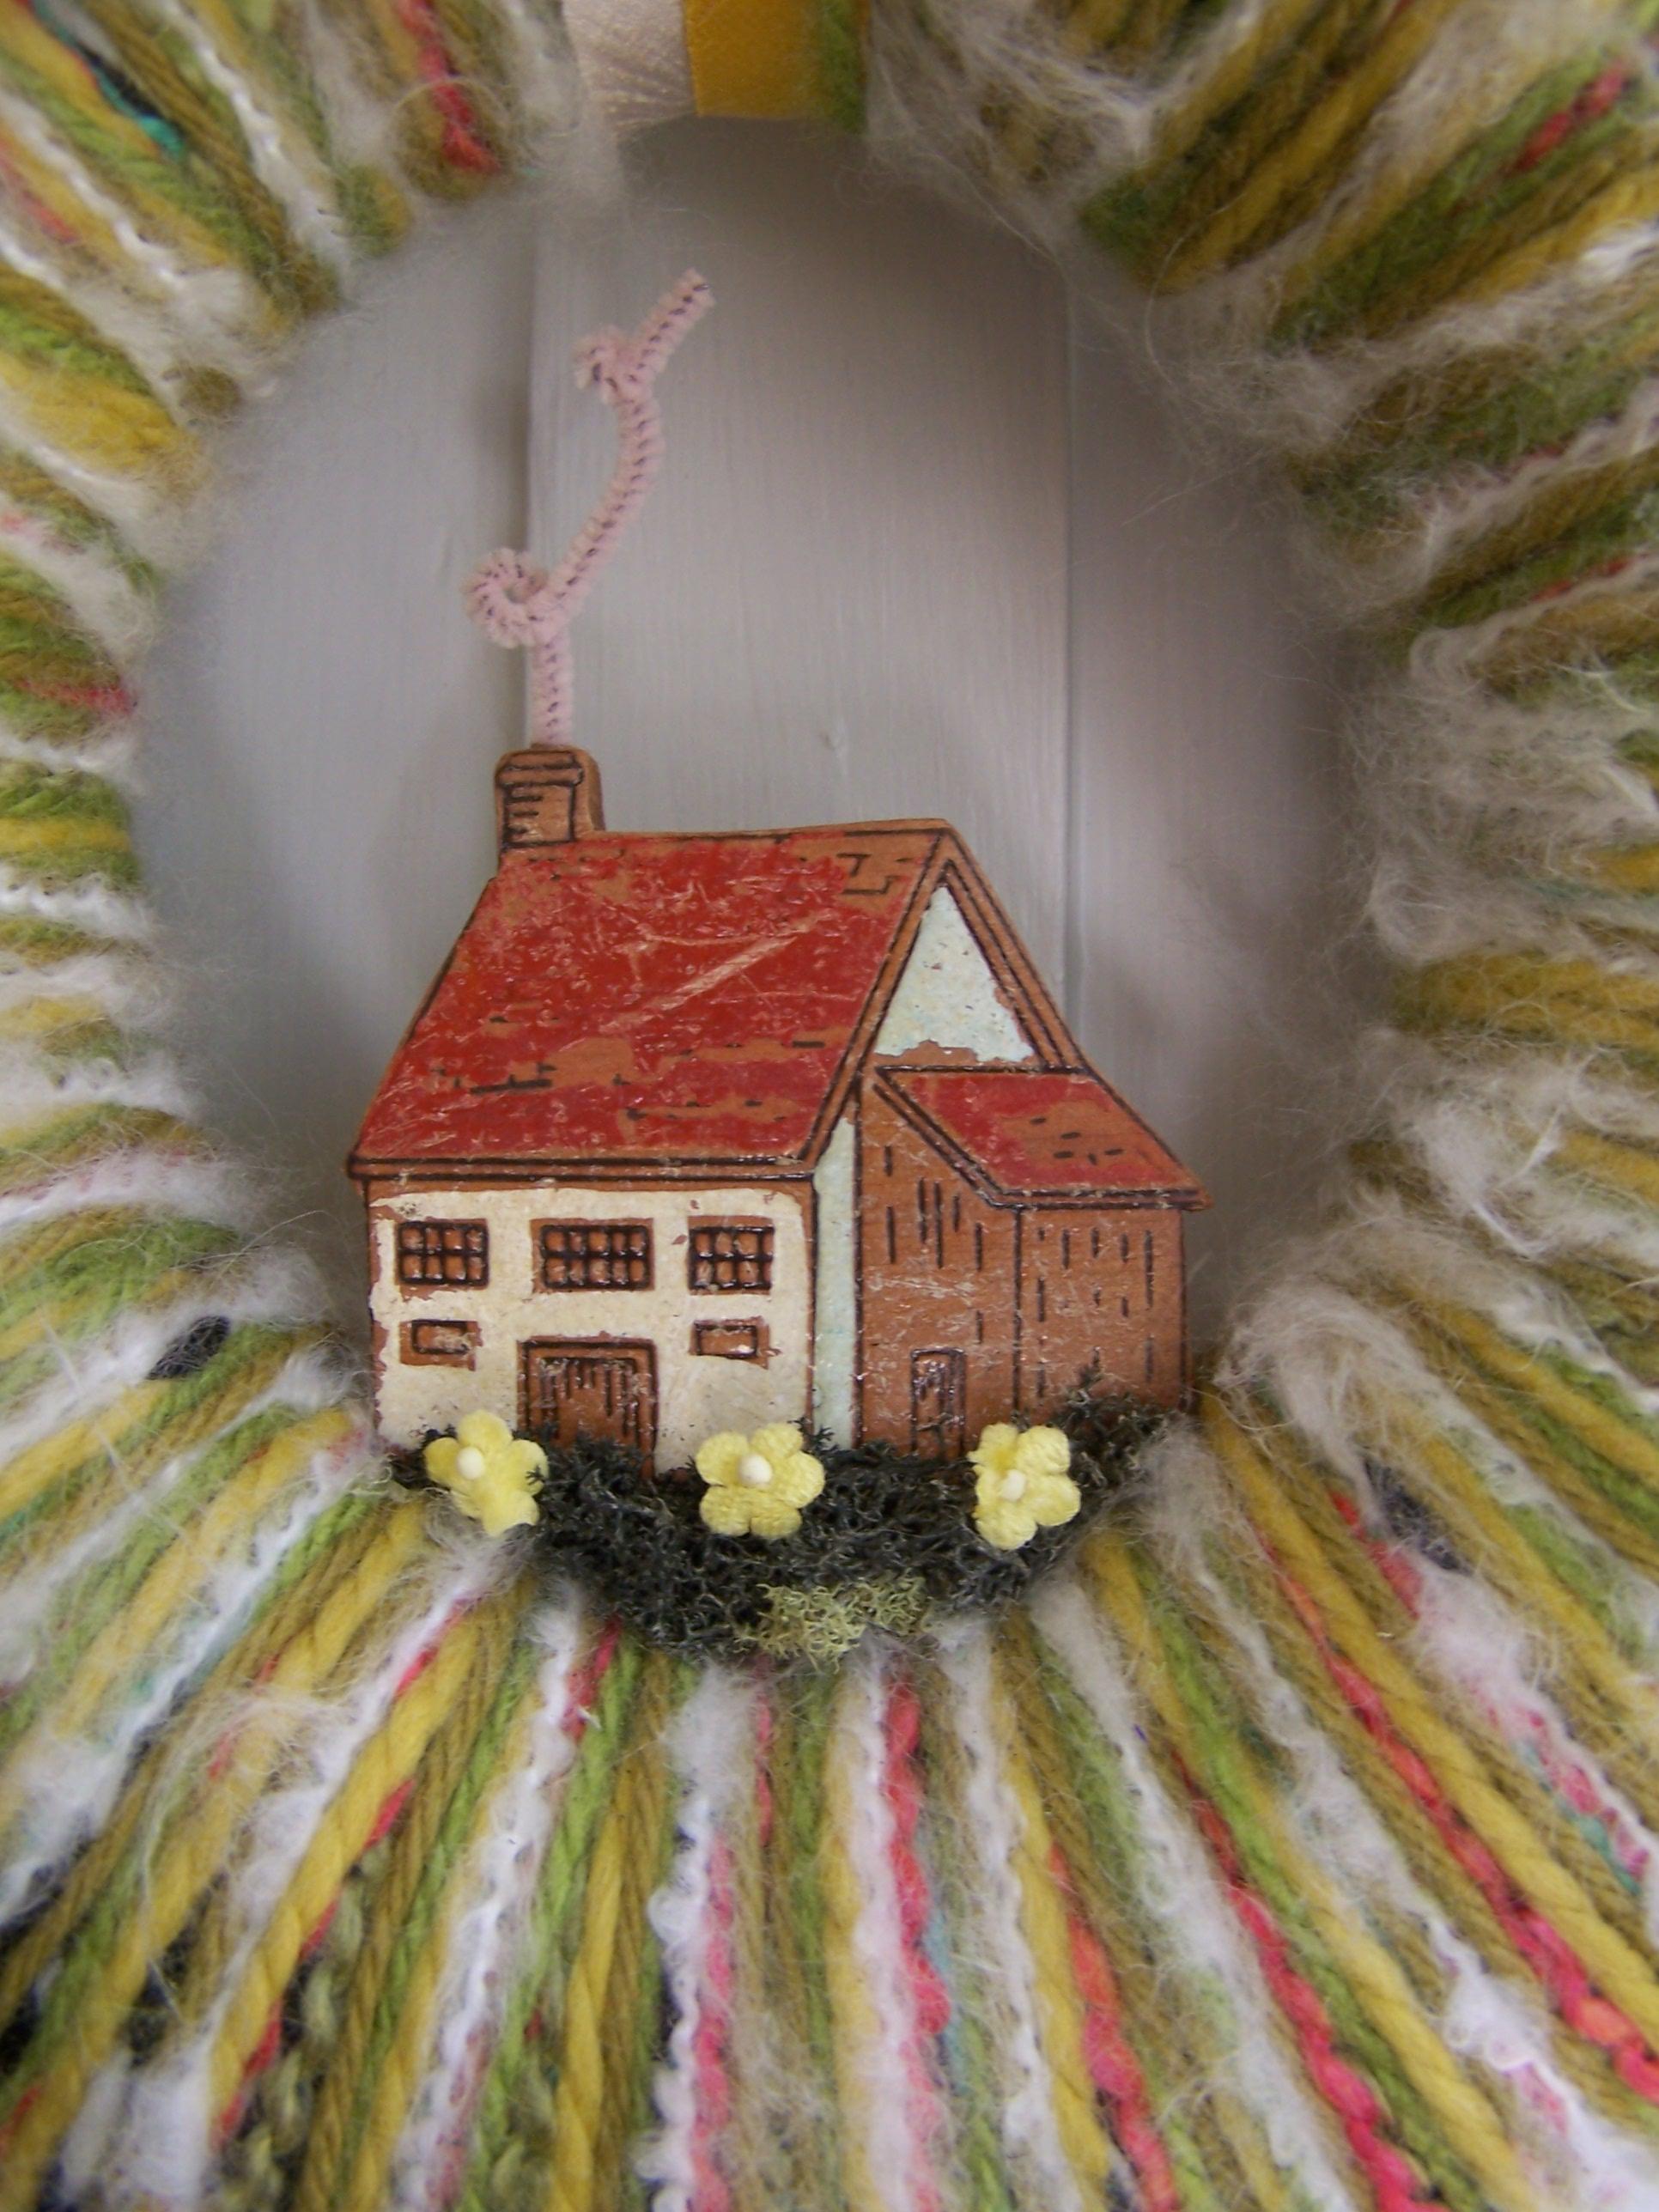 Home & Yarn Wreath, detail